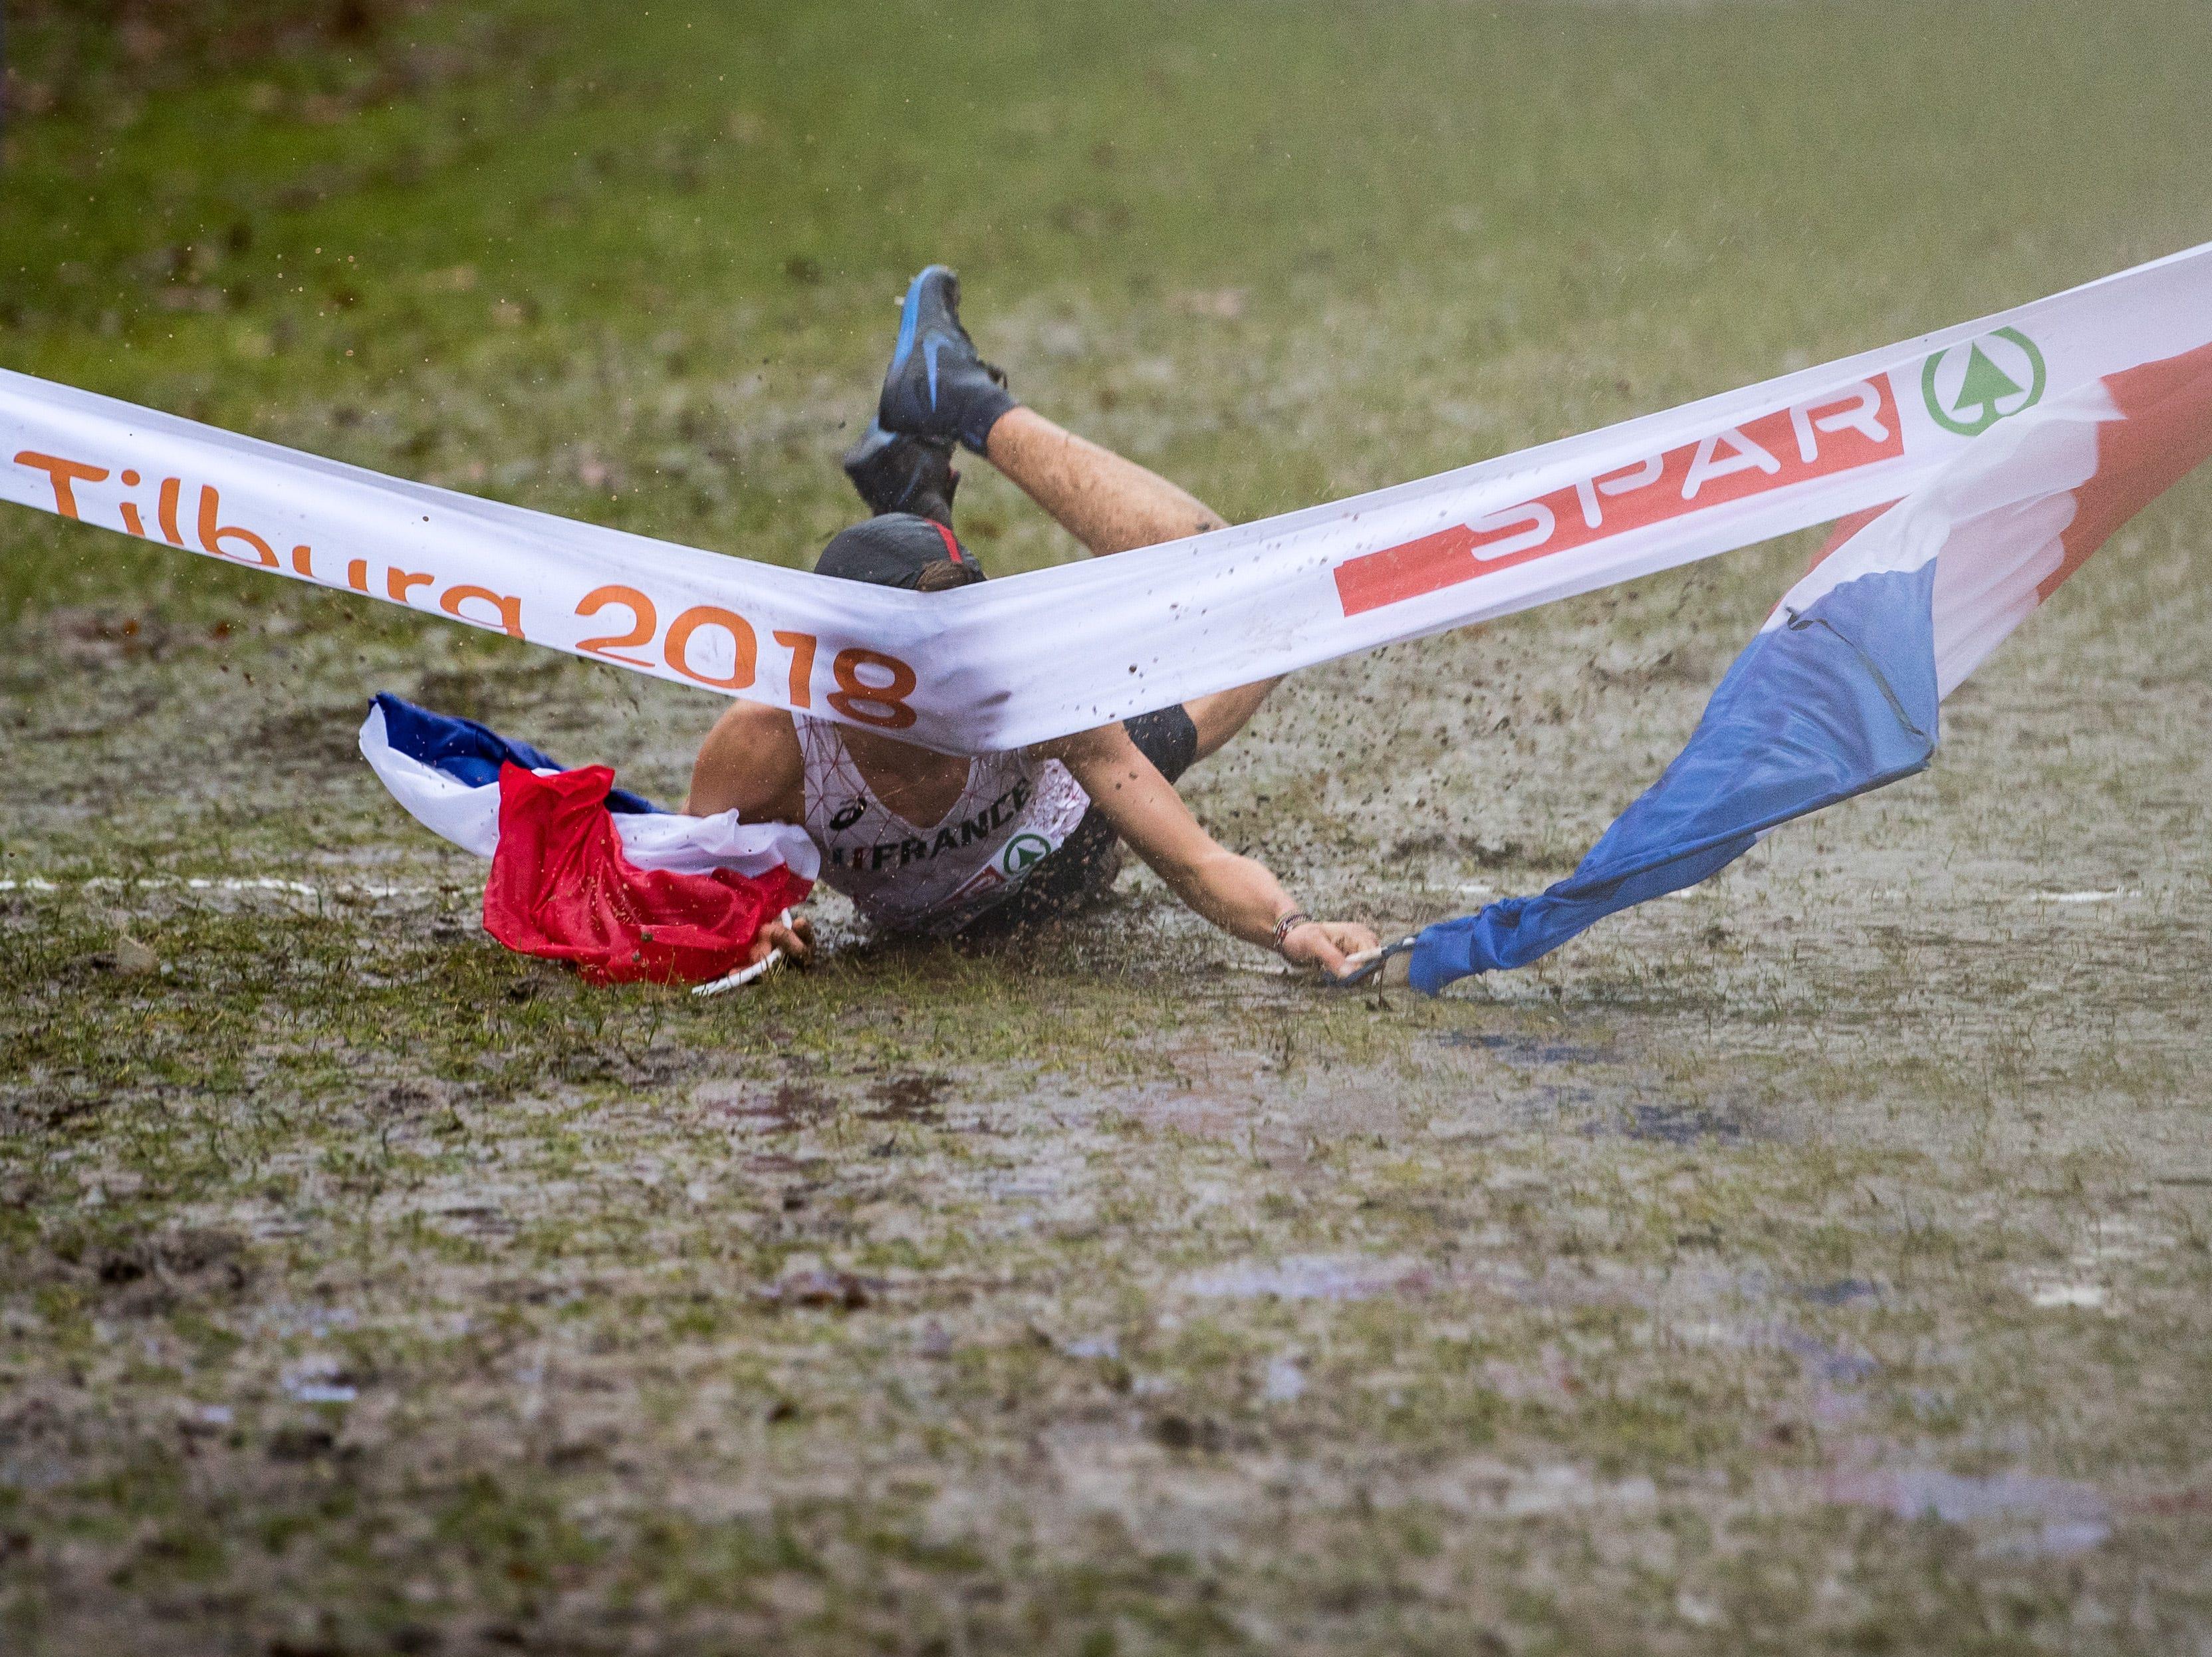 Jimmy Gressier of France, celebrates after winning the U23 Men's race of the SPAR European Cross Country Championships on December 9, 2018 in Tilburg, Netherlands.